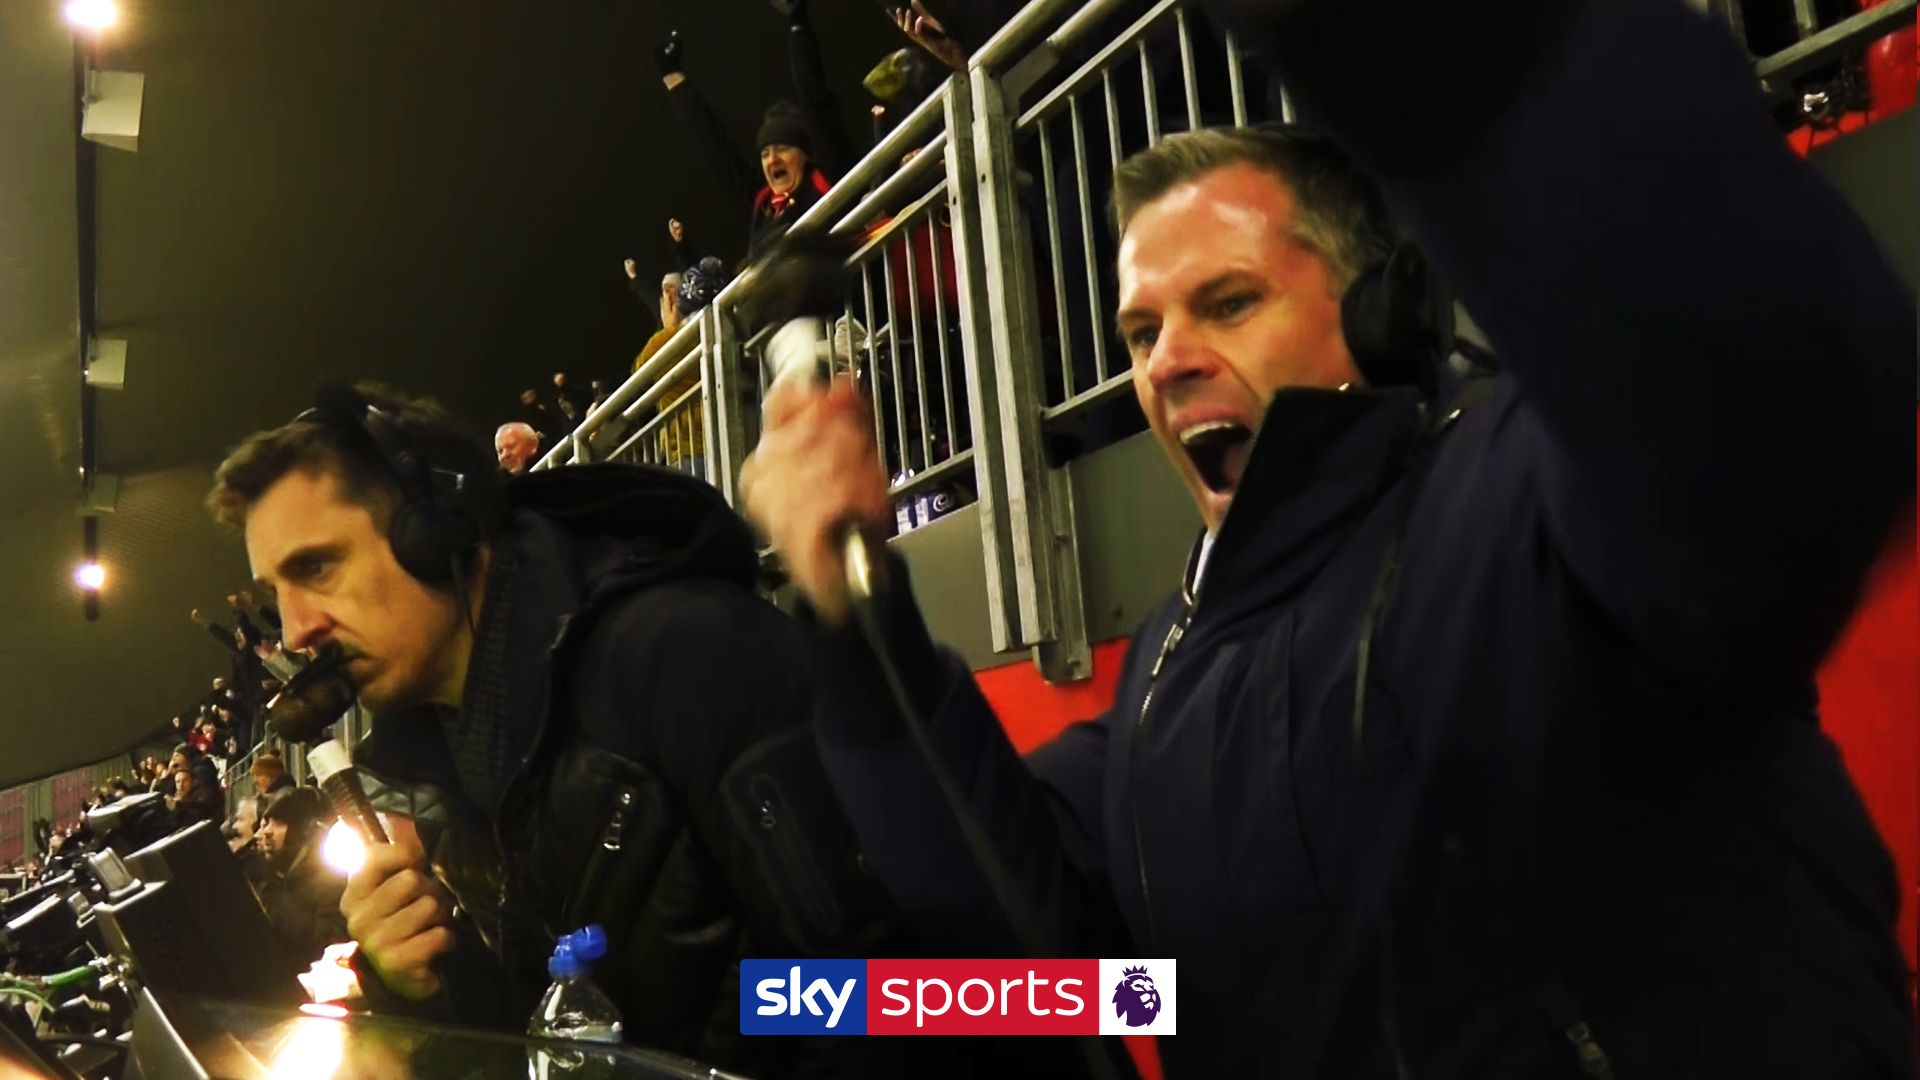 Liverpool vs Man Utd: The best videos